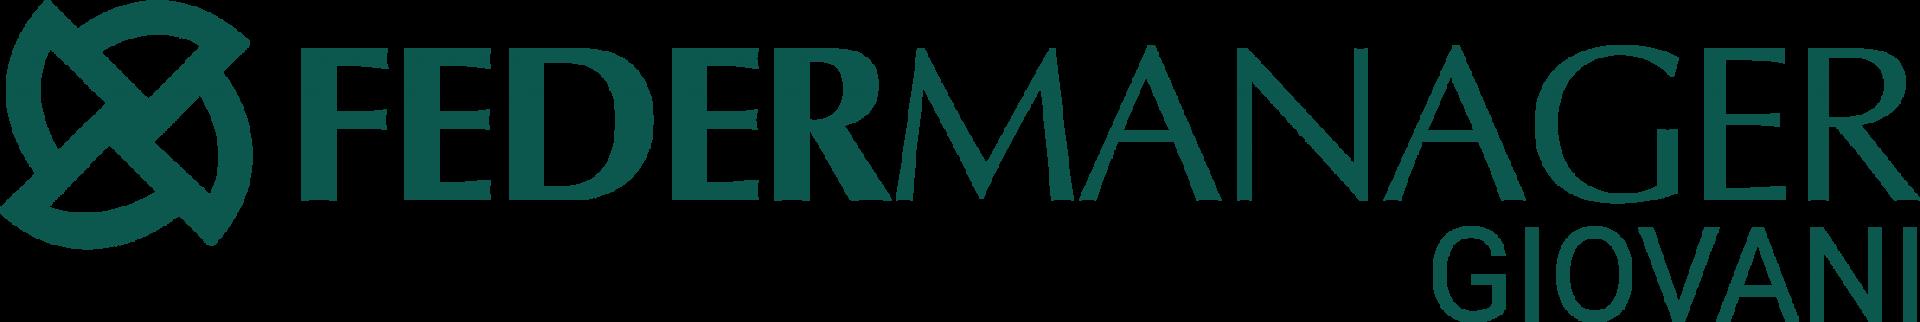 logo-Federmanager_GIOVANI__vettoriale